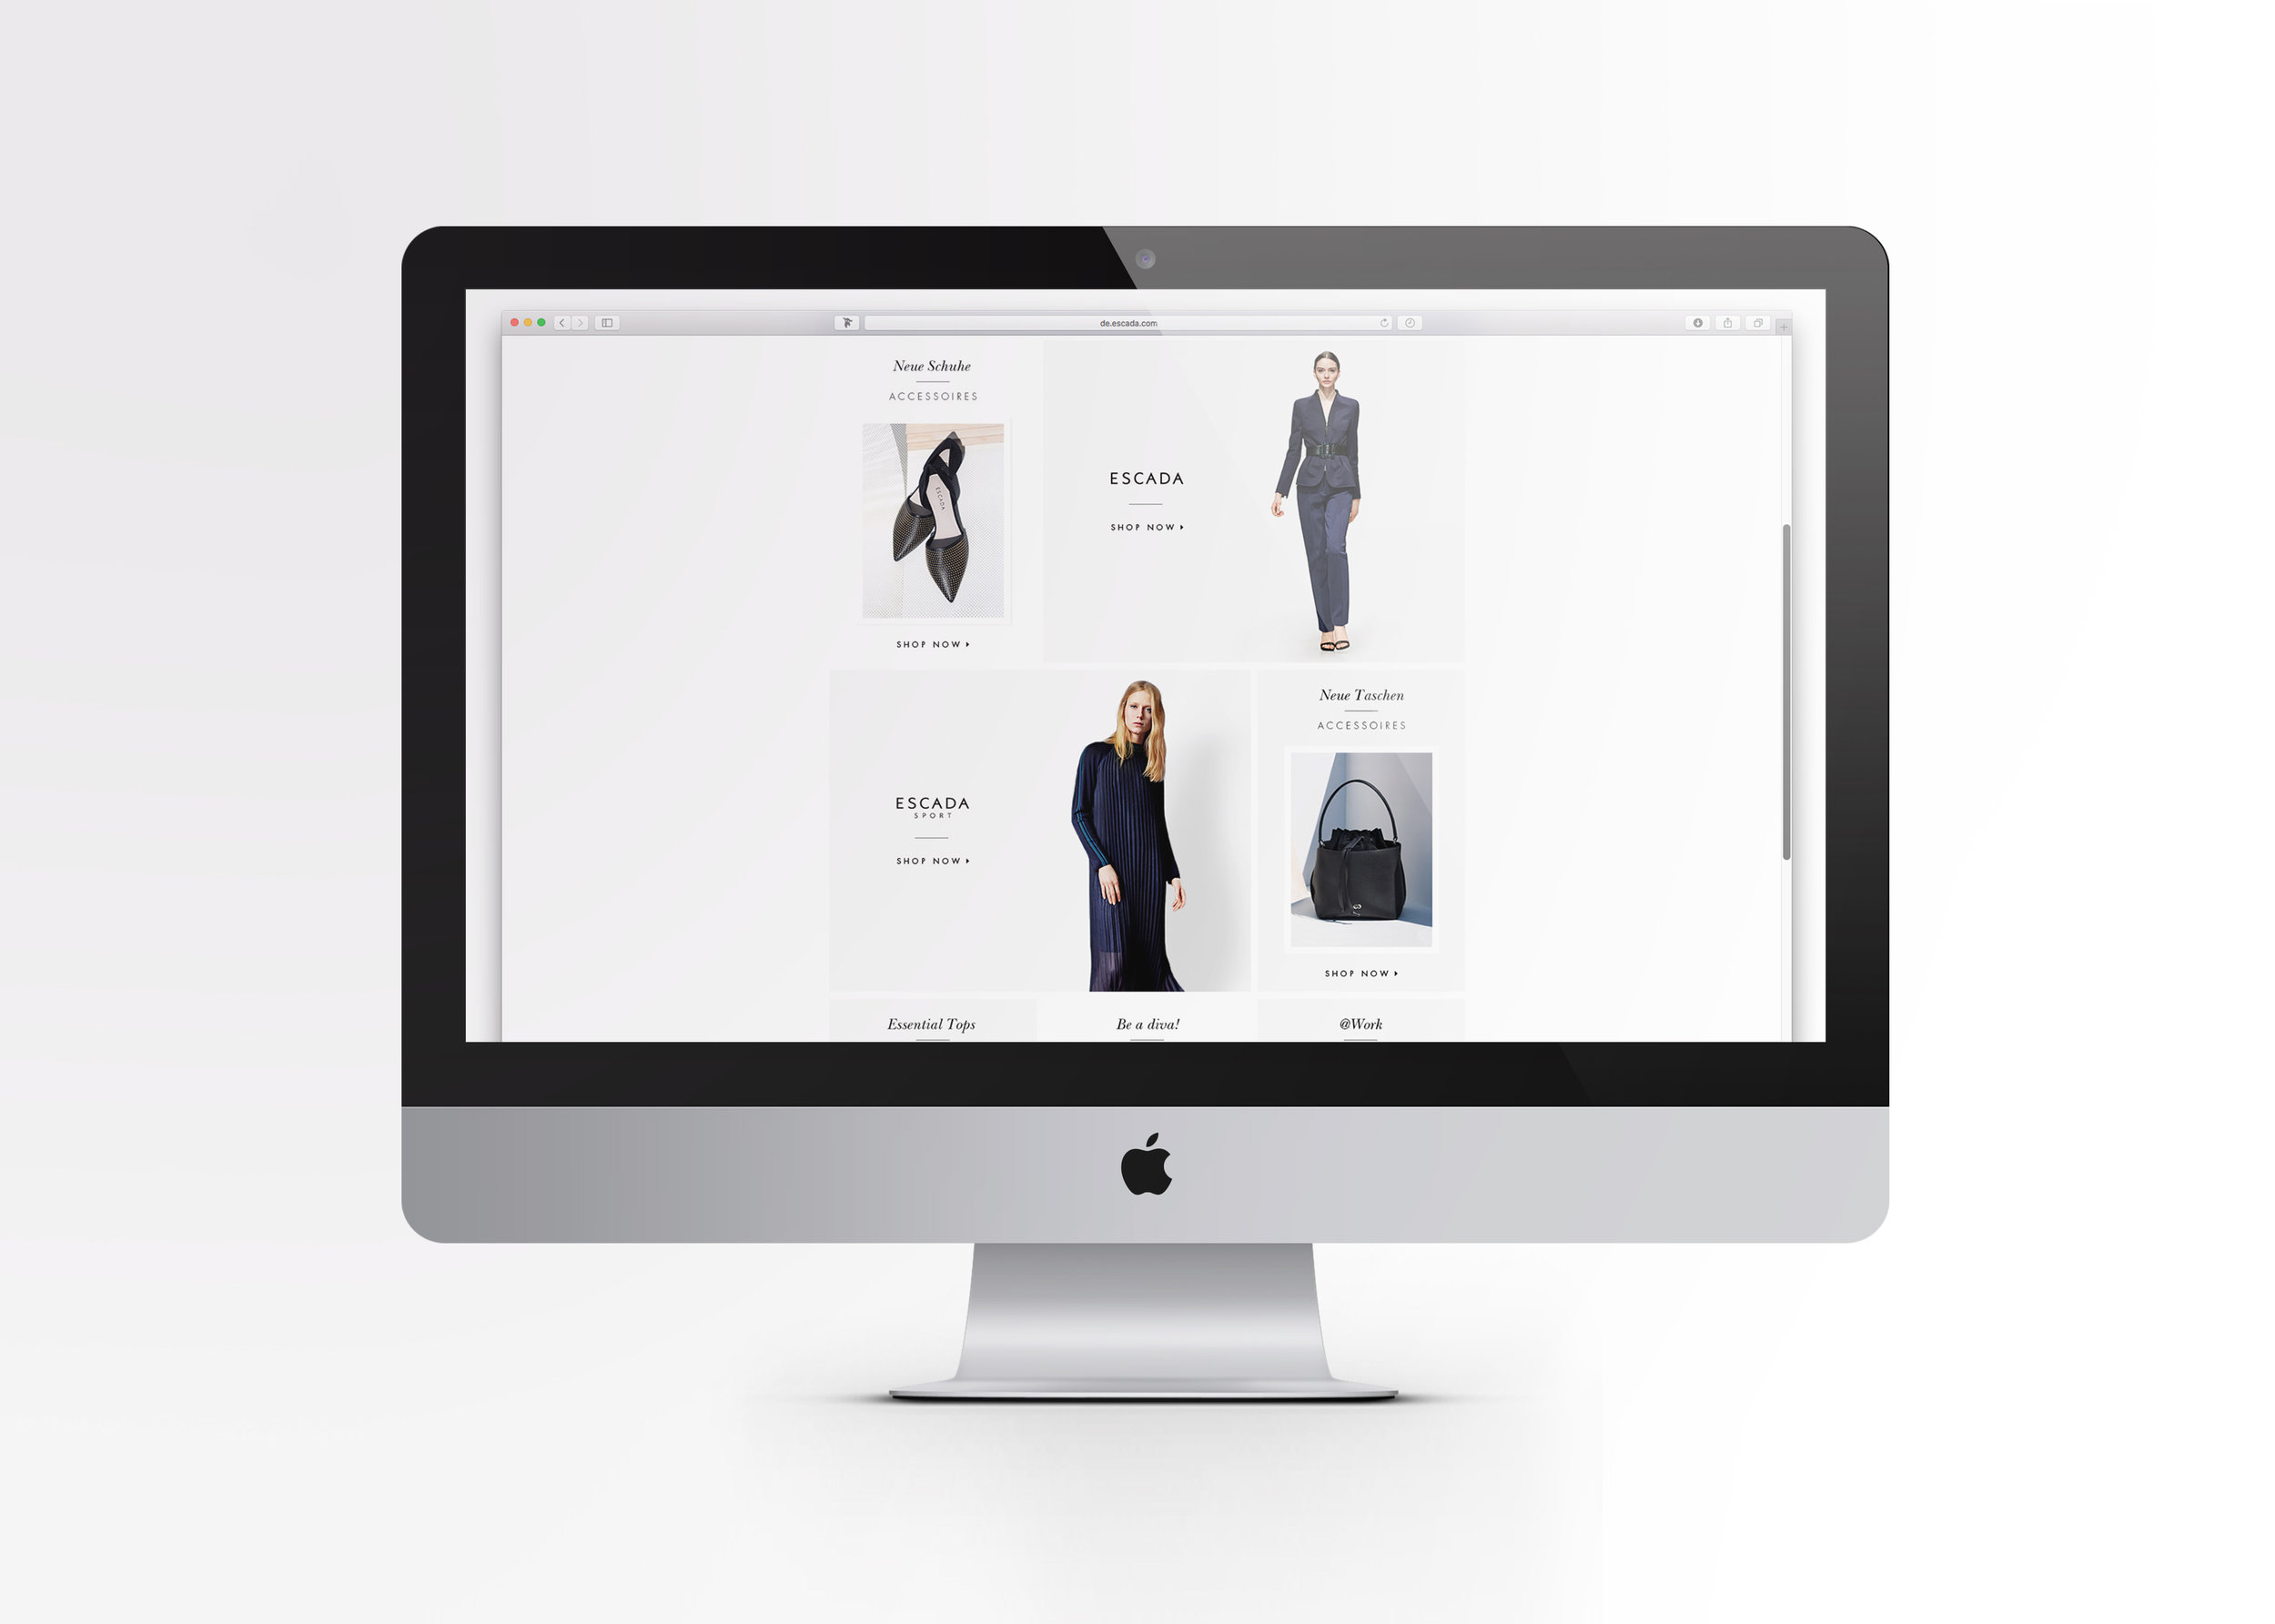 Livia_Ritthaler_Studio_L_ESCADA_Homepage.jpg